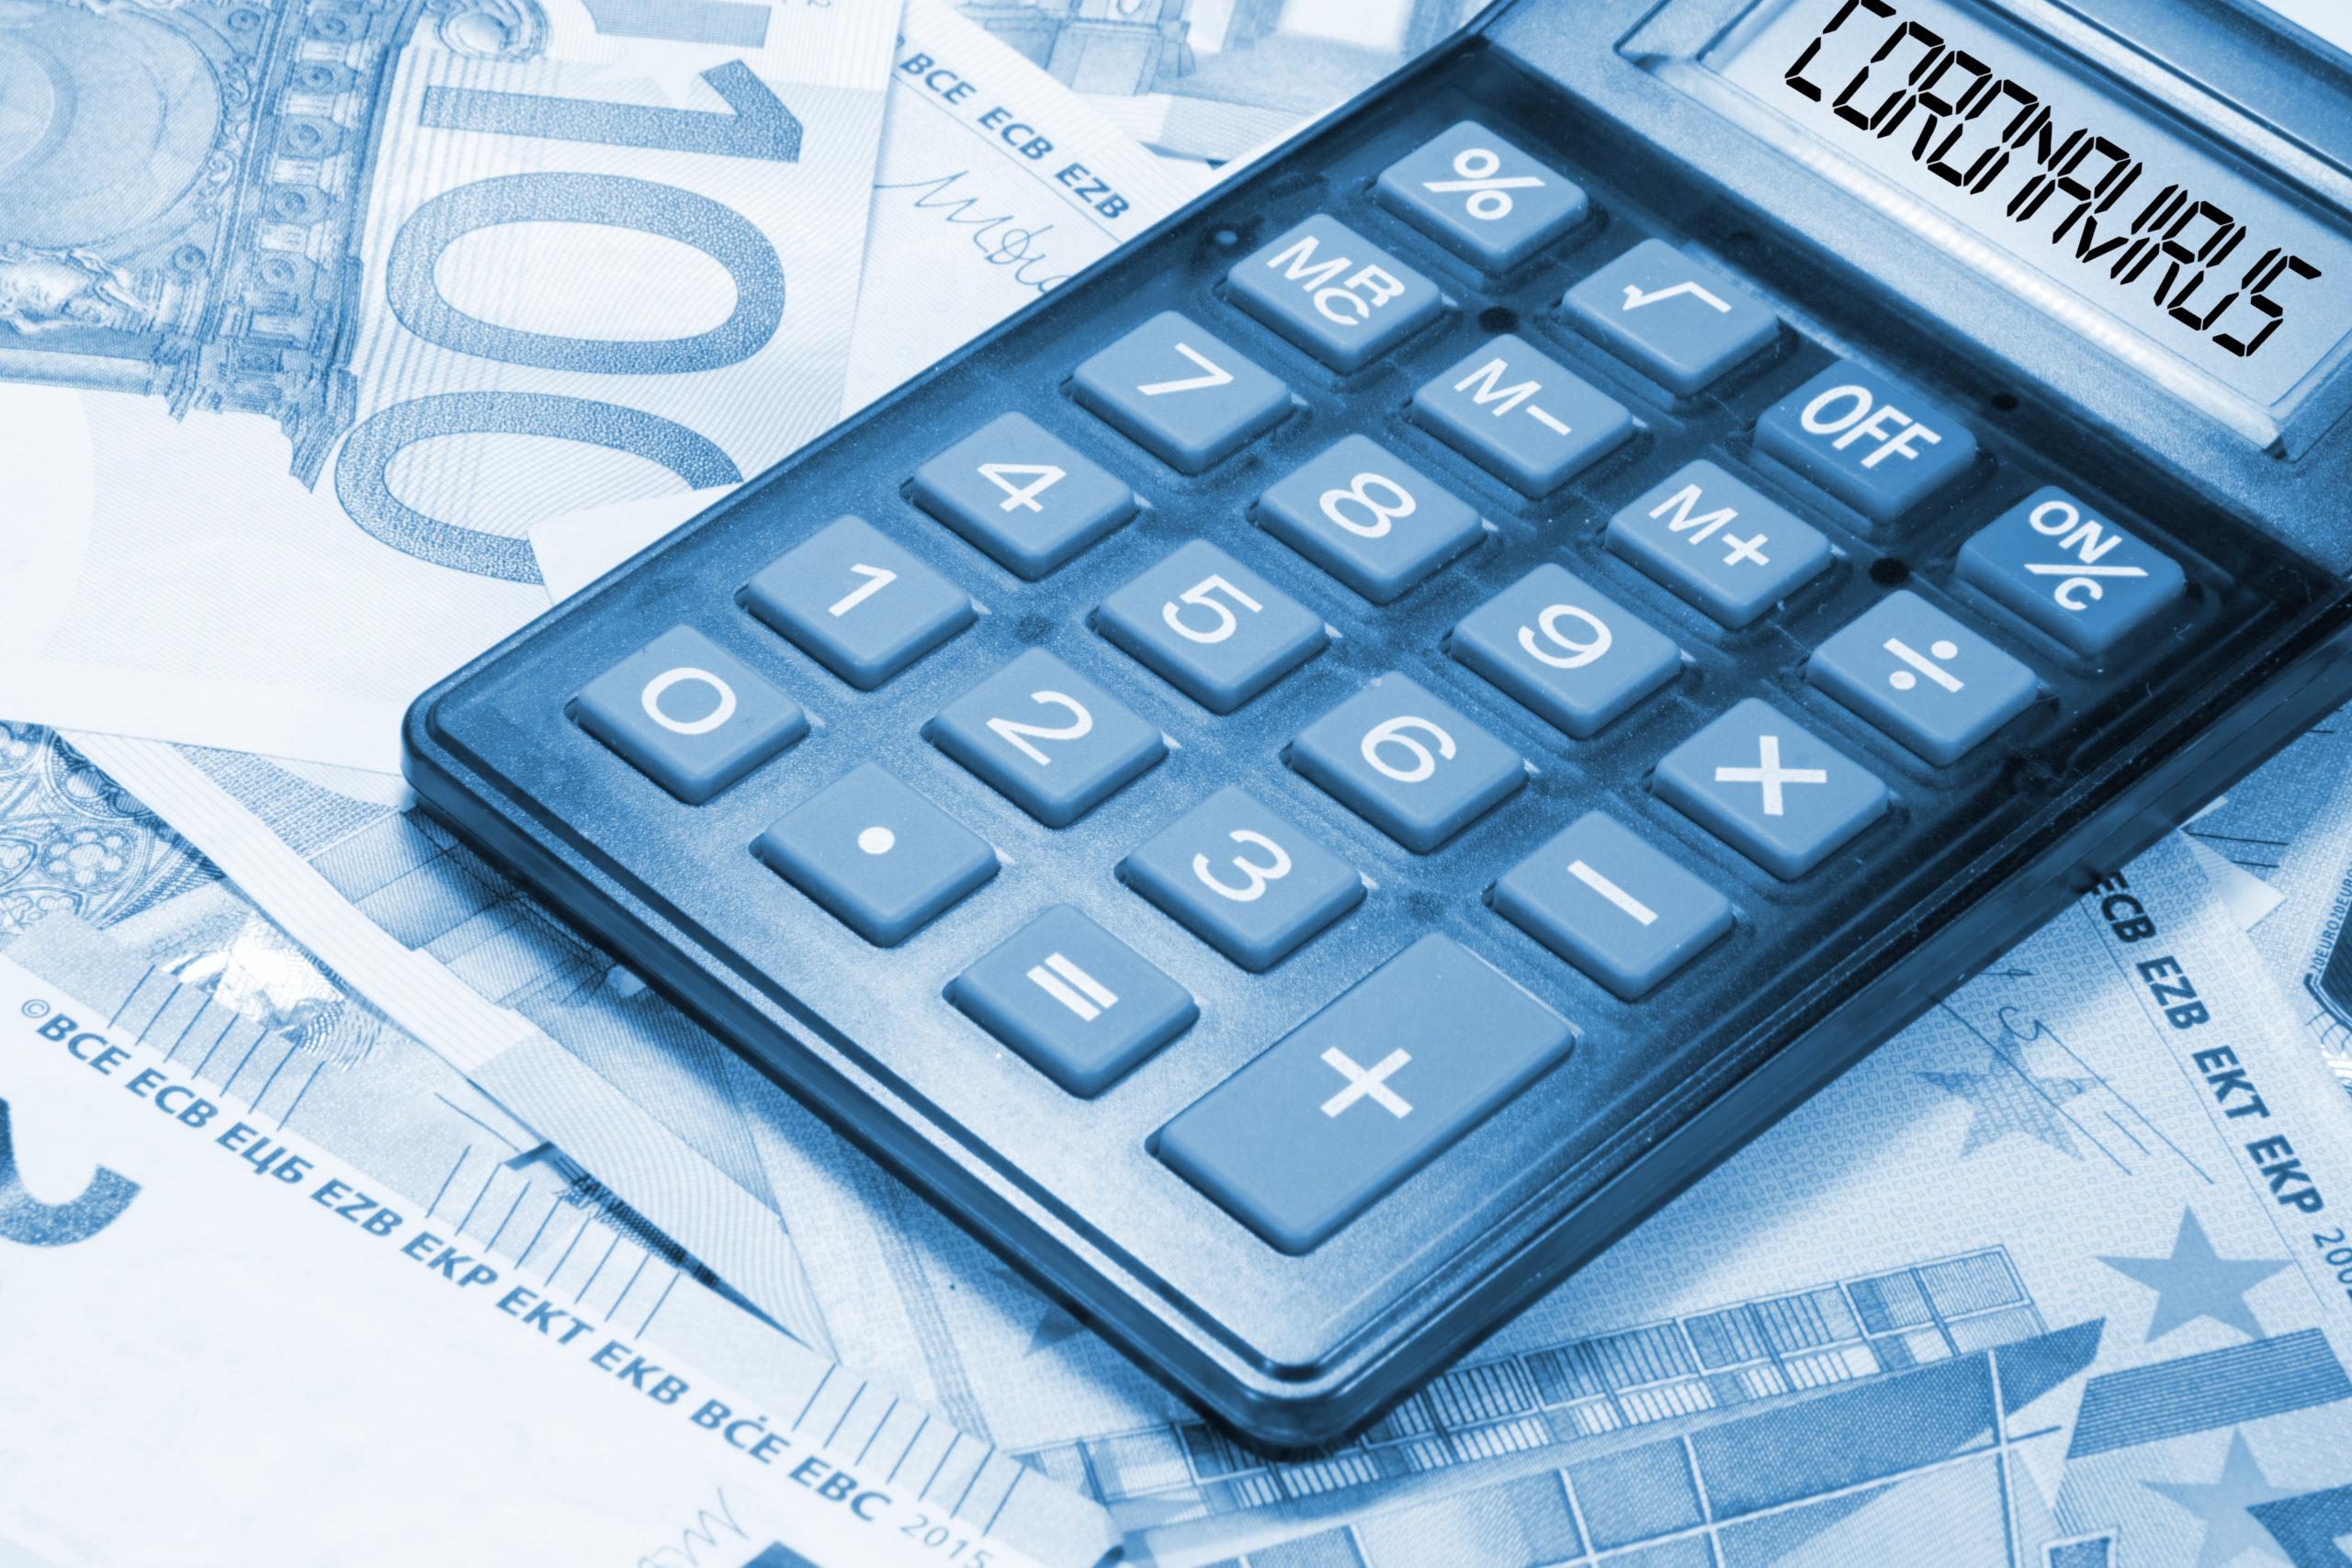 Corona Blog: Fixkostenzuschuss 800.000 - 24.11.2020